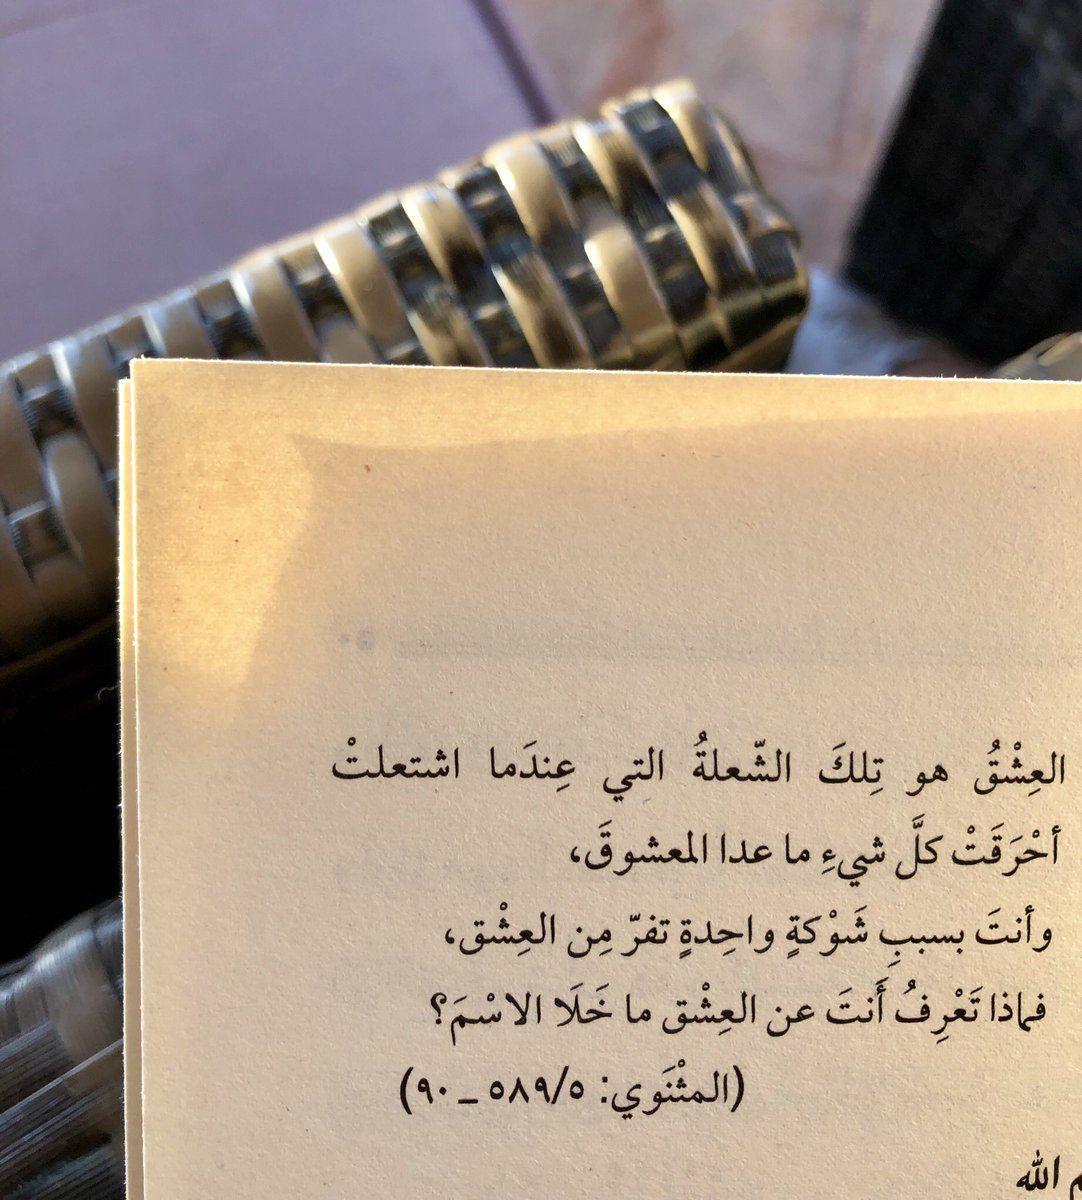 جلال الدين الرومي Rumiarb تويتر Quotes Words Arabic Quotes